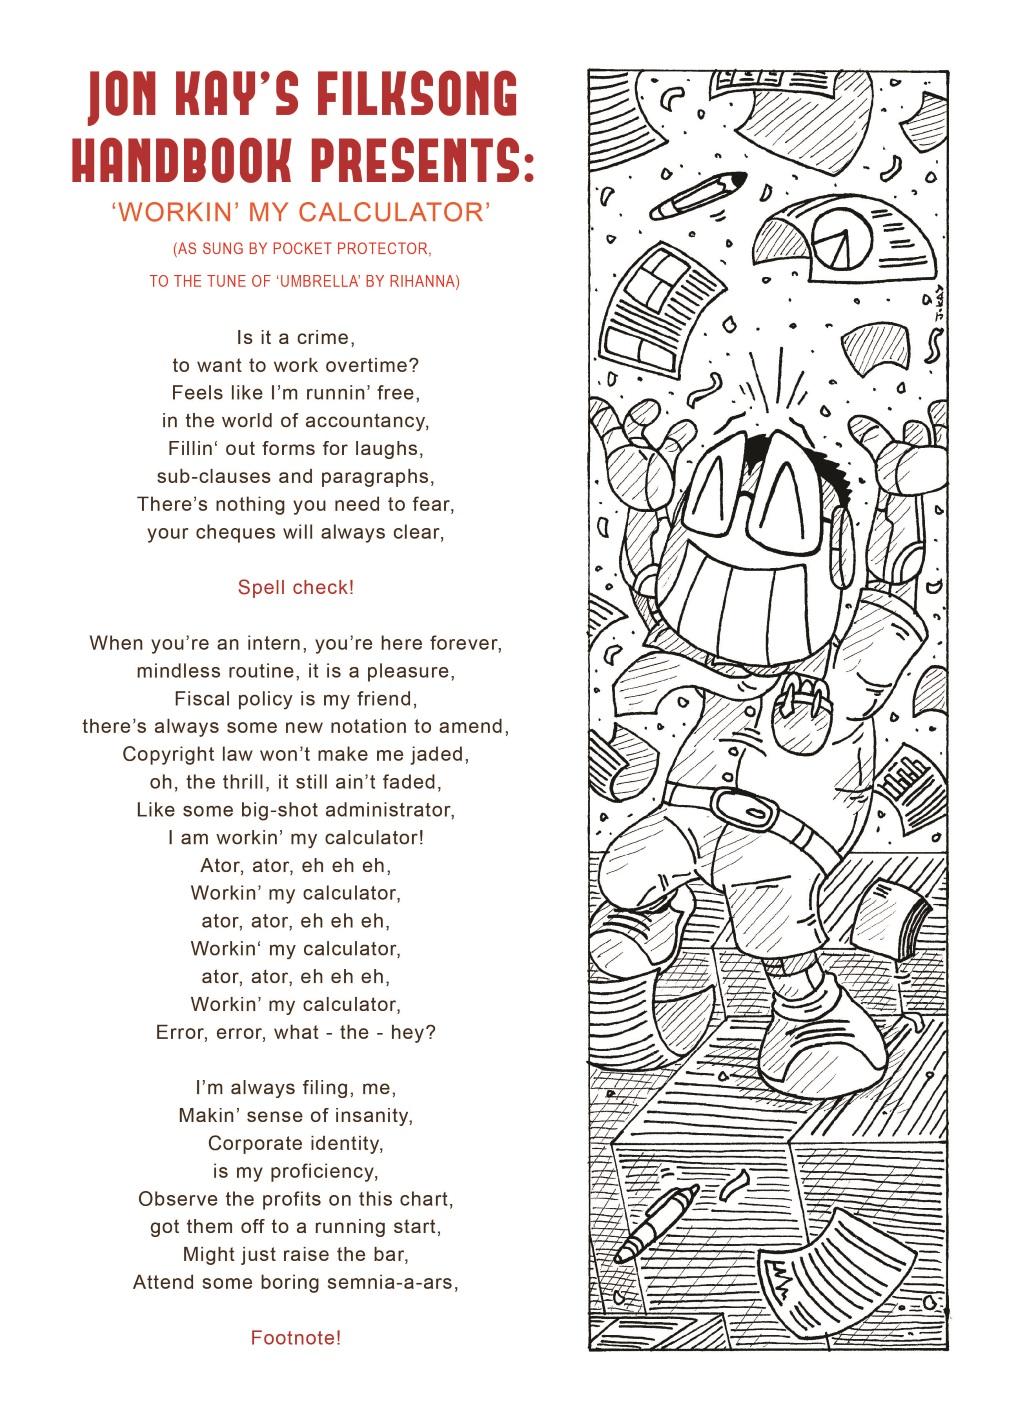 Filksong fiesta: Pocket Protector sings 'Calculator' (1 of 2)